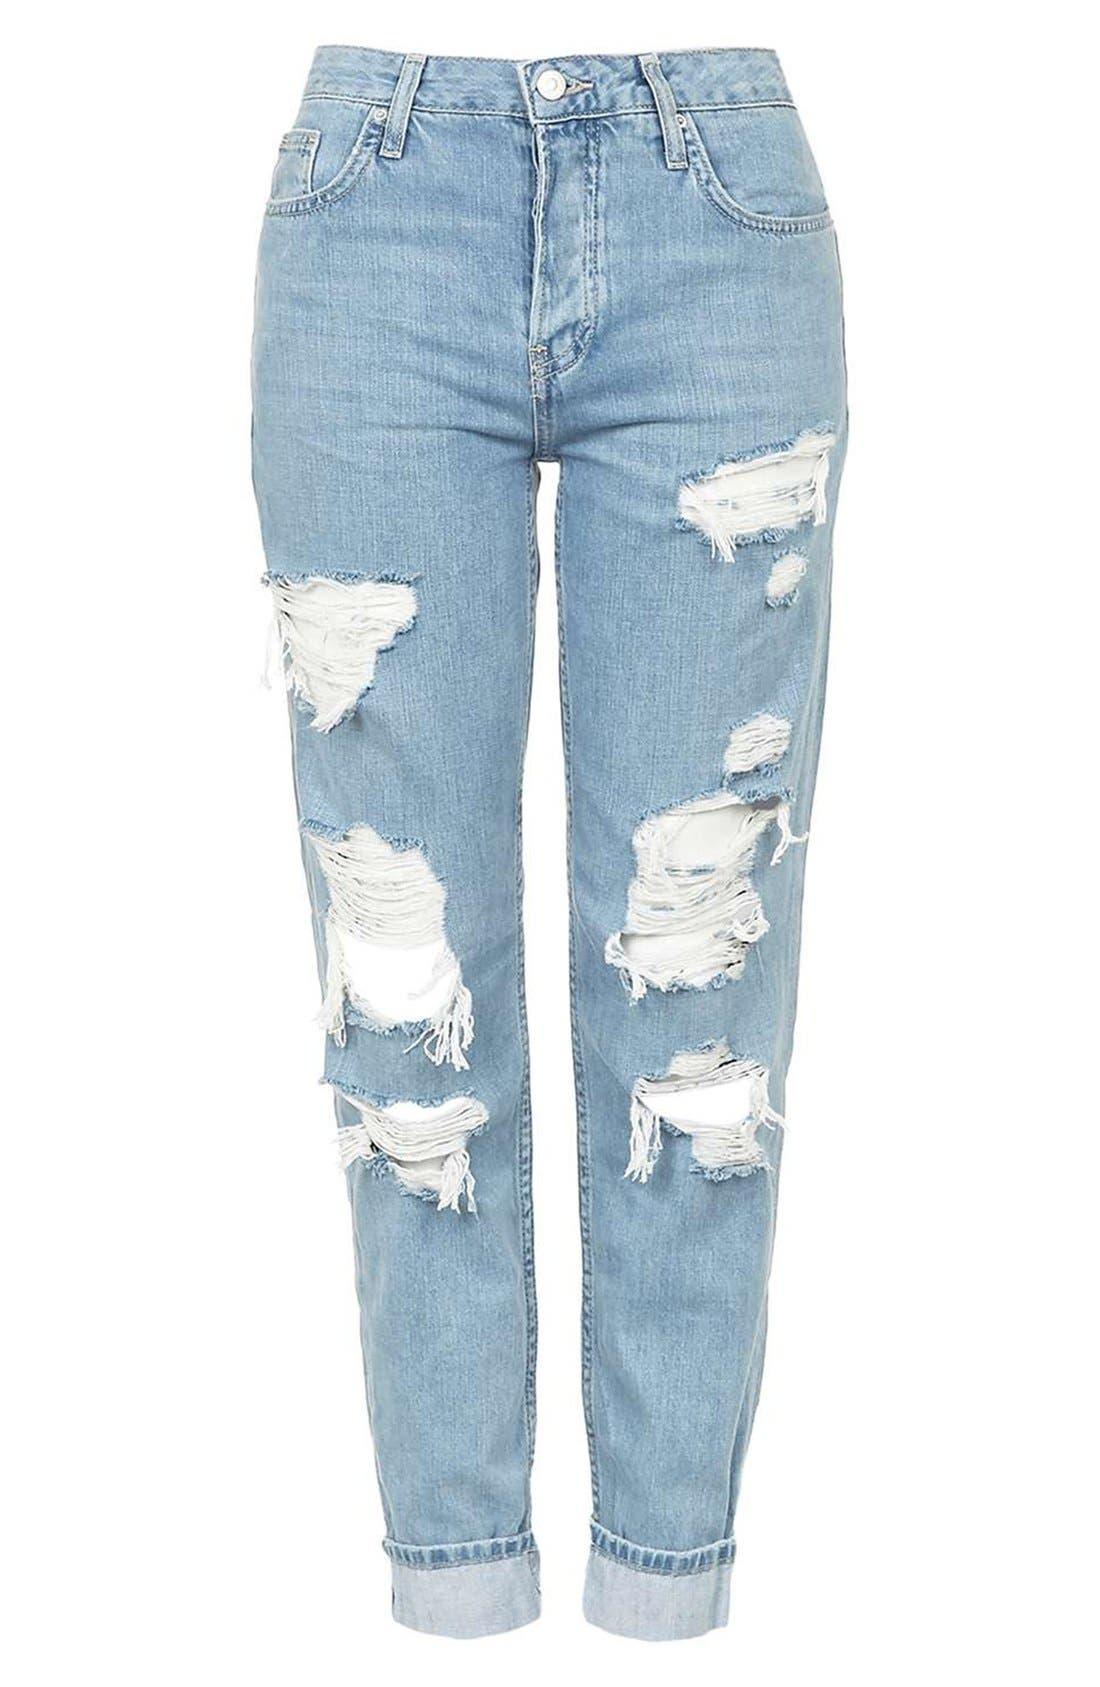 TOPSHOP, 'Hayden' Super Ripped Boyfriend Jeans, Alternate thumbnail 2, color, 420